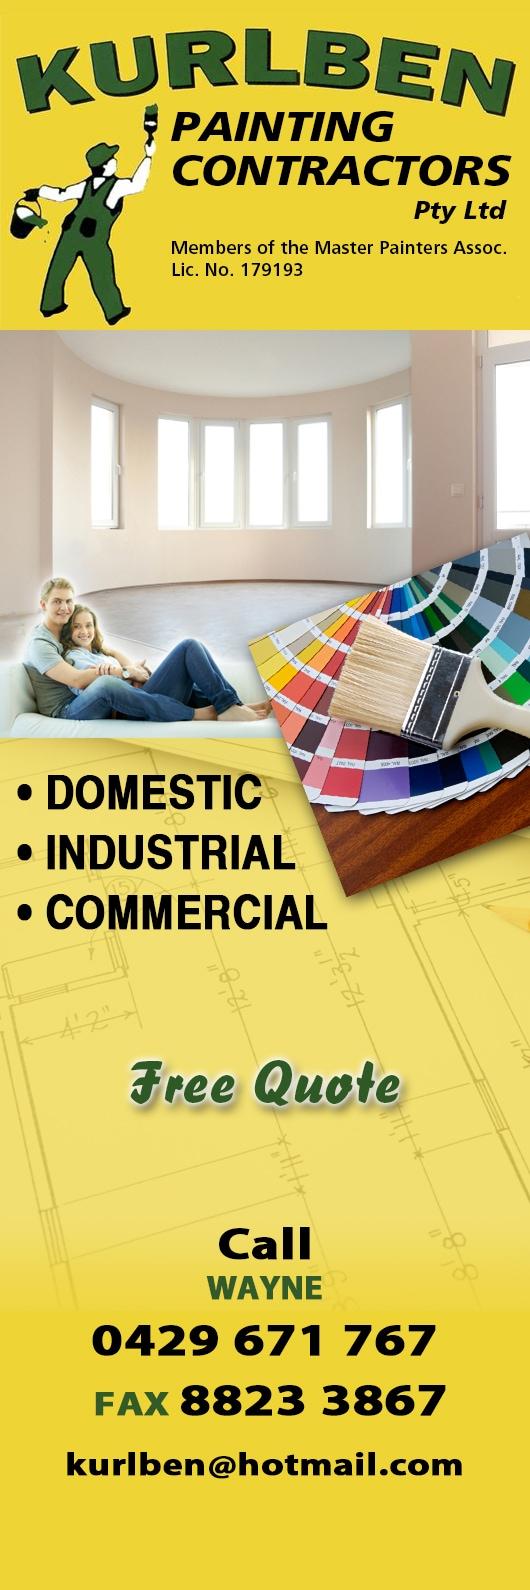 Kurlben Painting Contractors Pty Ltd - Painters & Decorators - Kadina